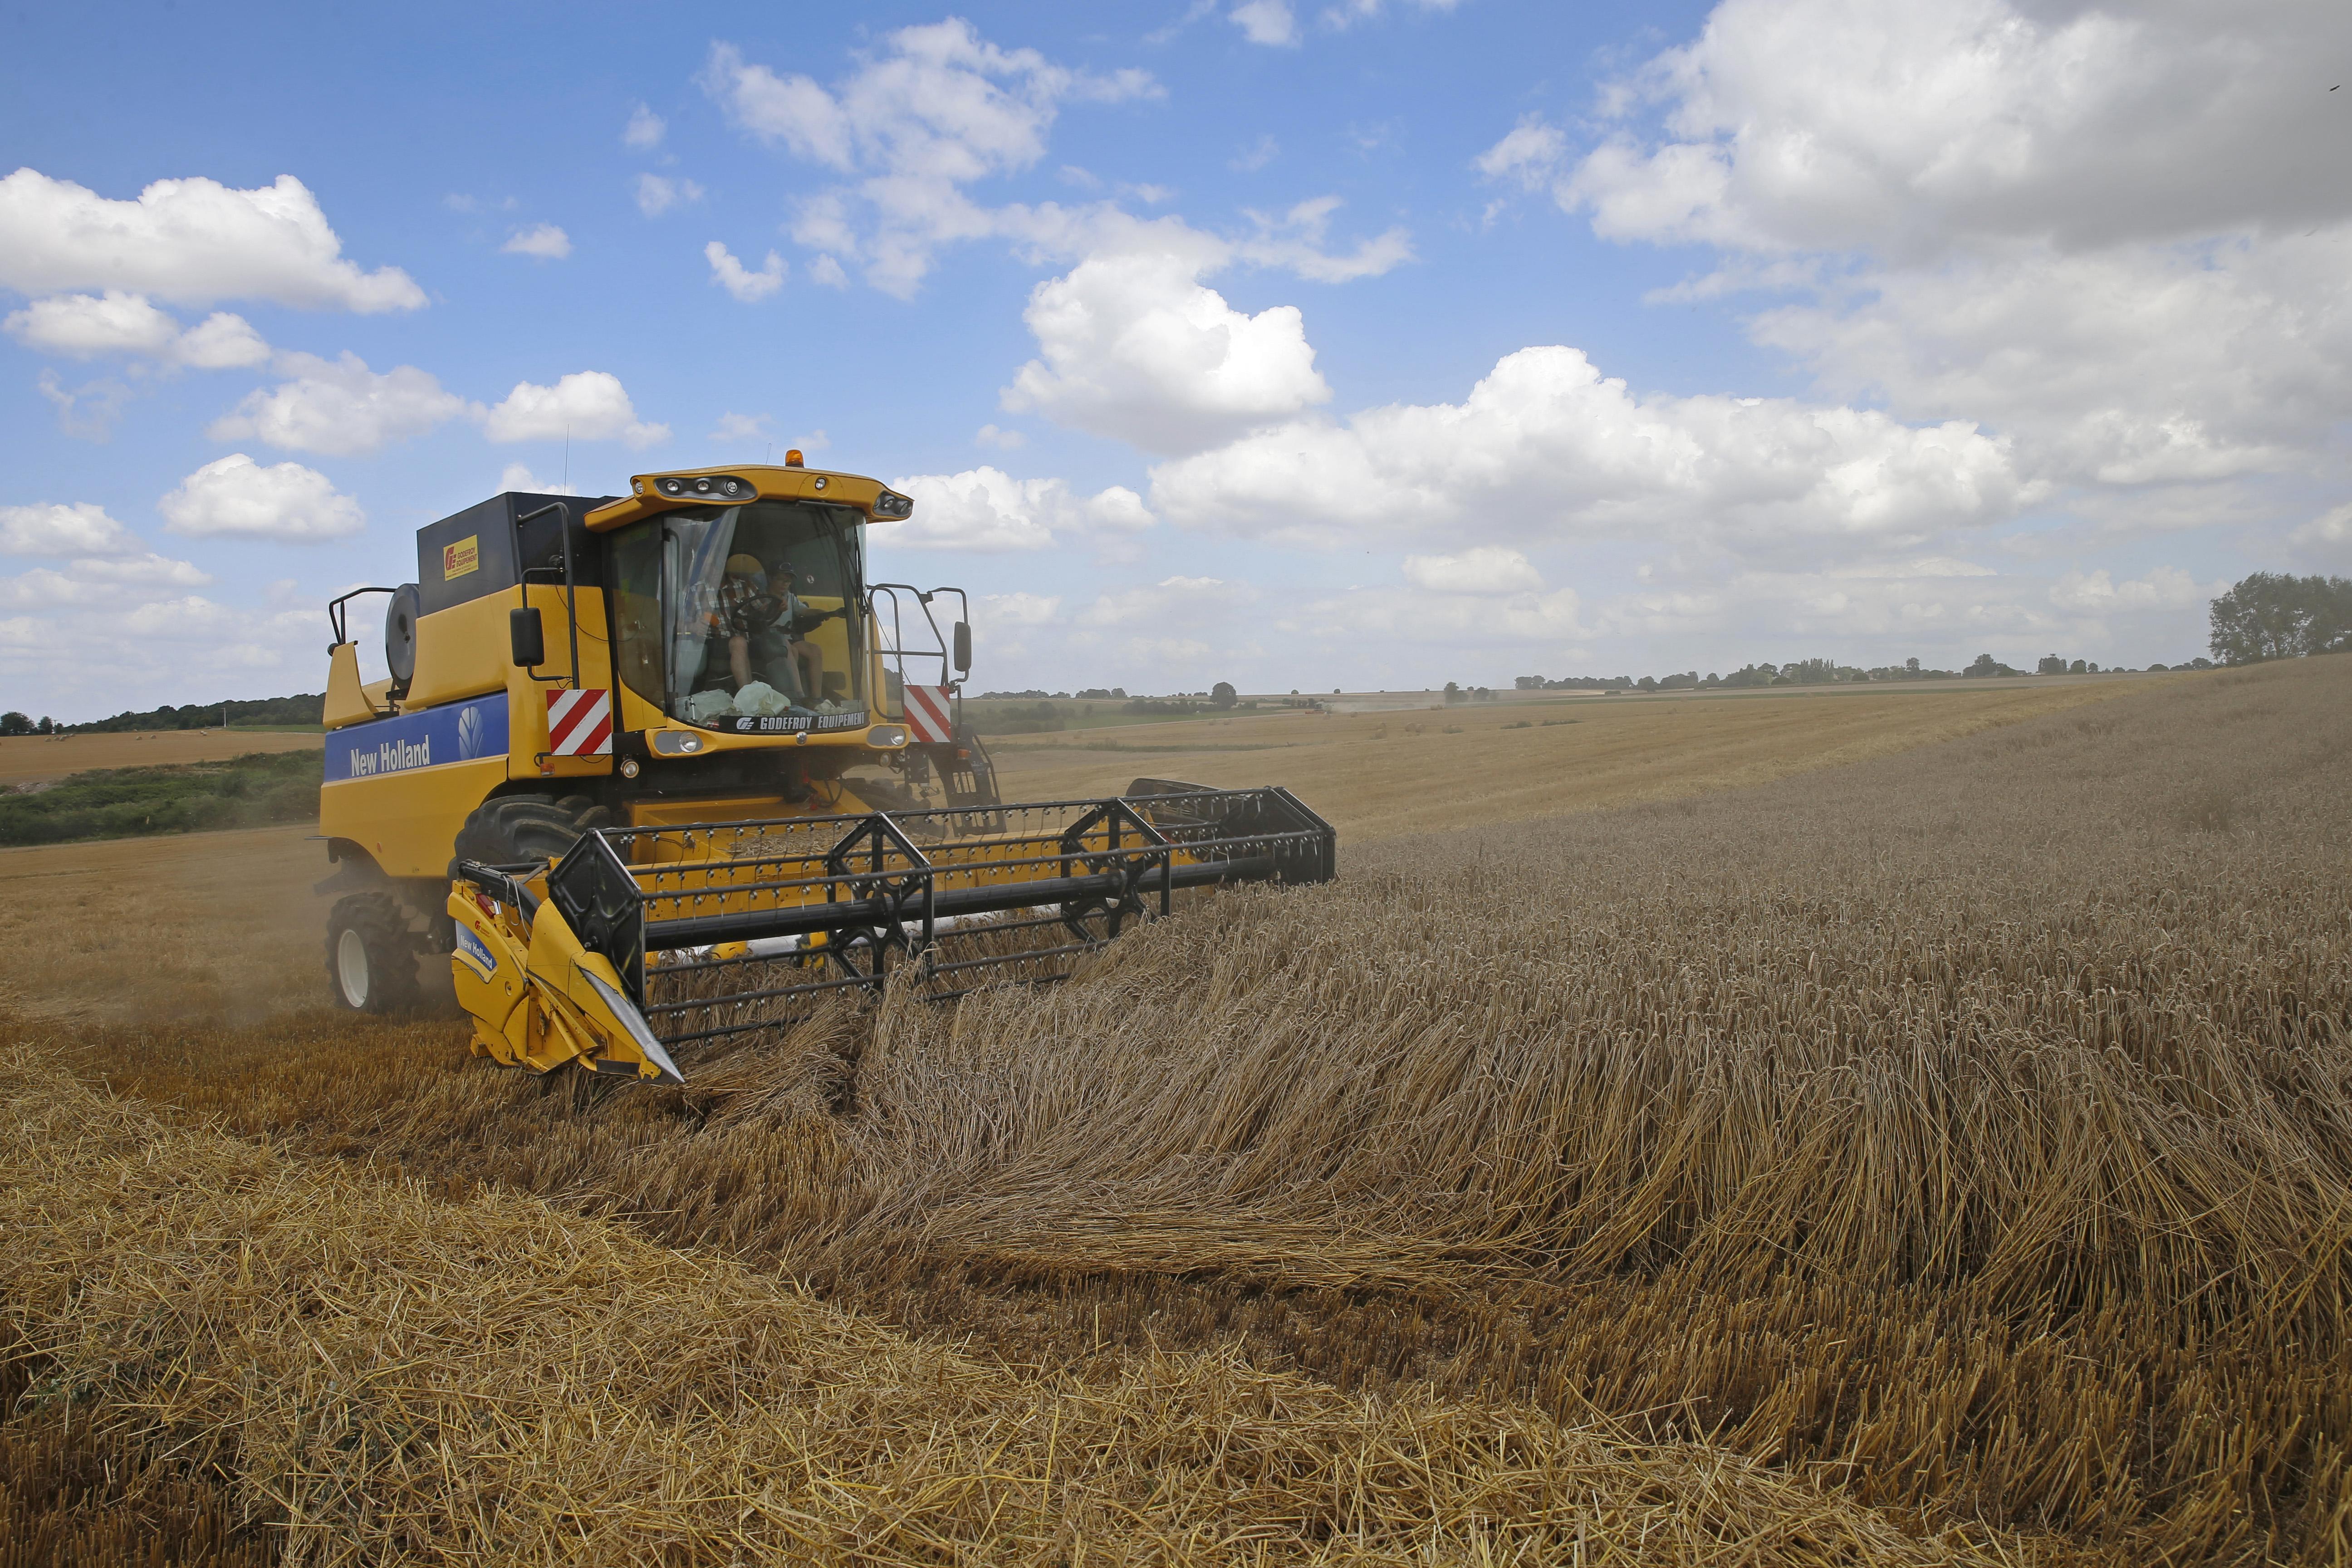 A French farmer harvests wheat in Honnecourt-sur-Escaut, near Cambrai, France, August 9, 2016. REUTERS/Pascal Rossignol